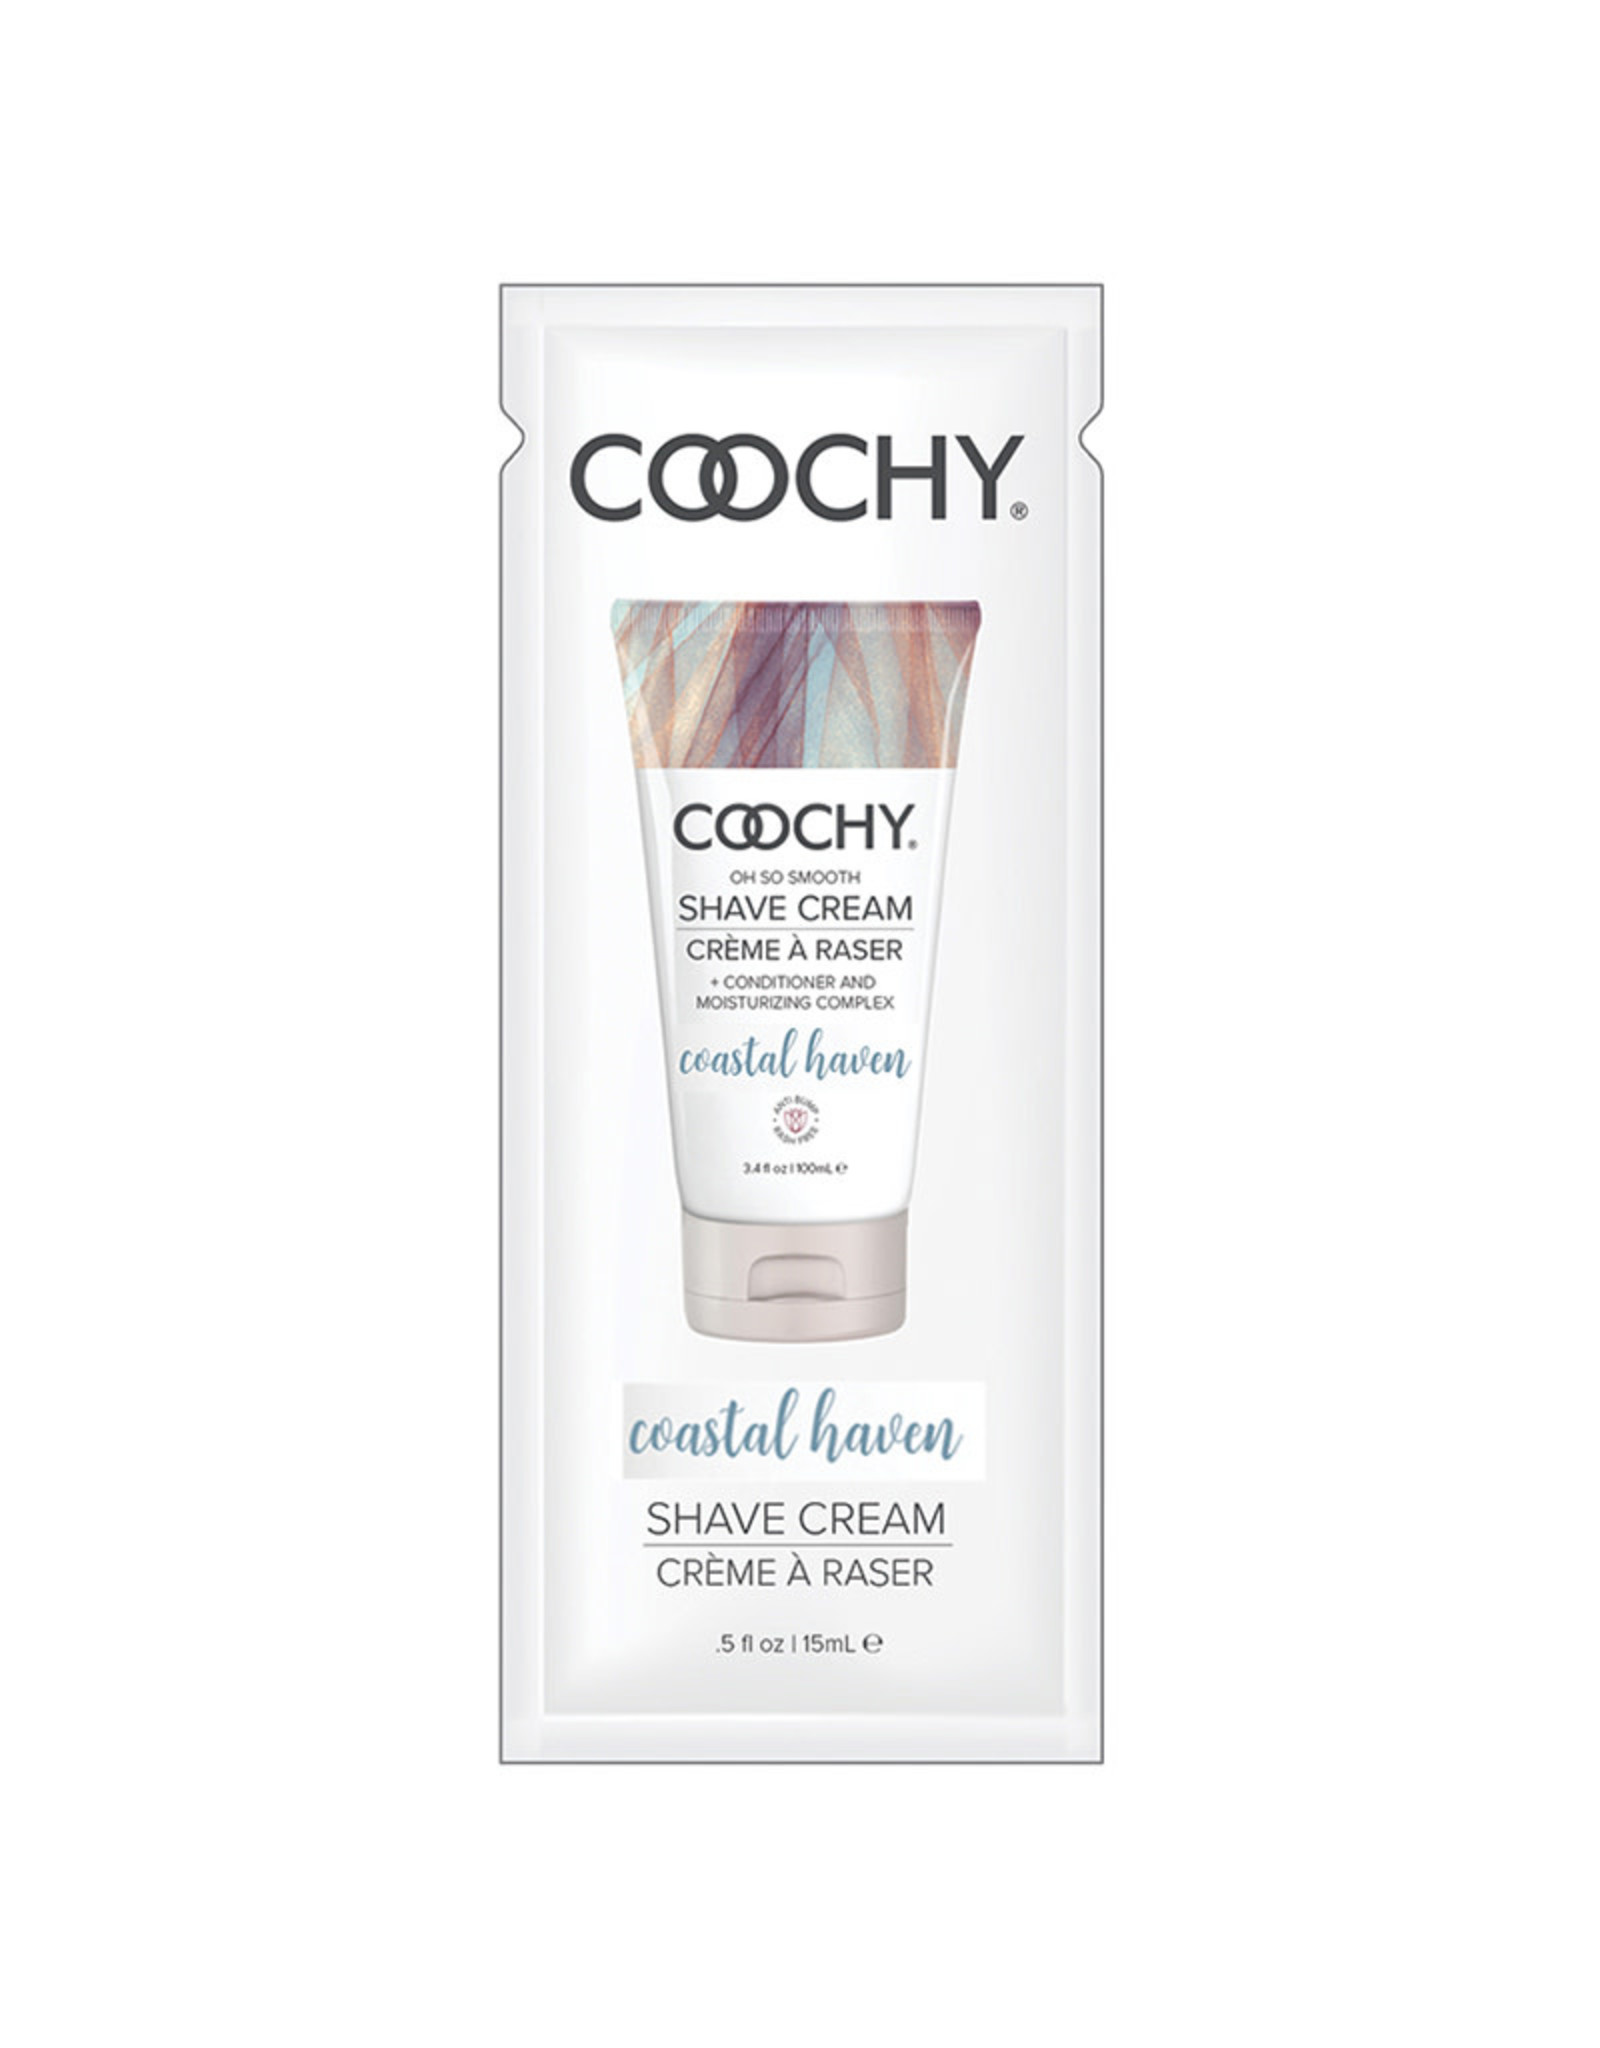 Classic Brands Coochy Foil - Coastal Haven - 15ml